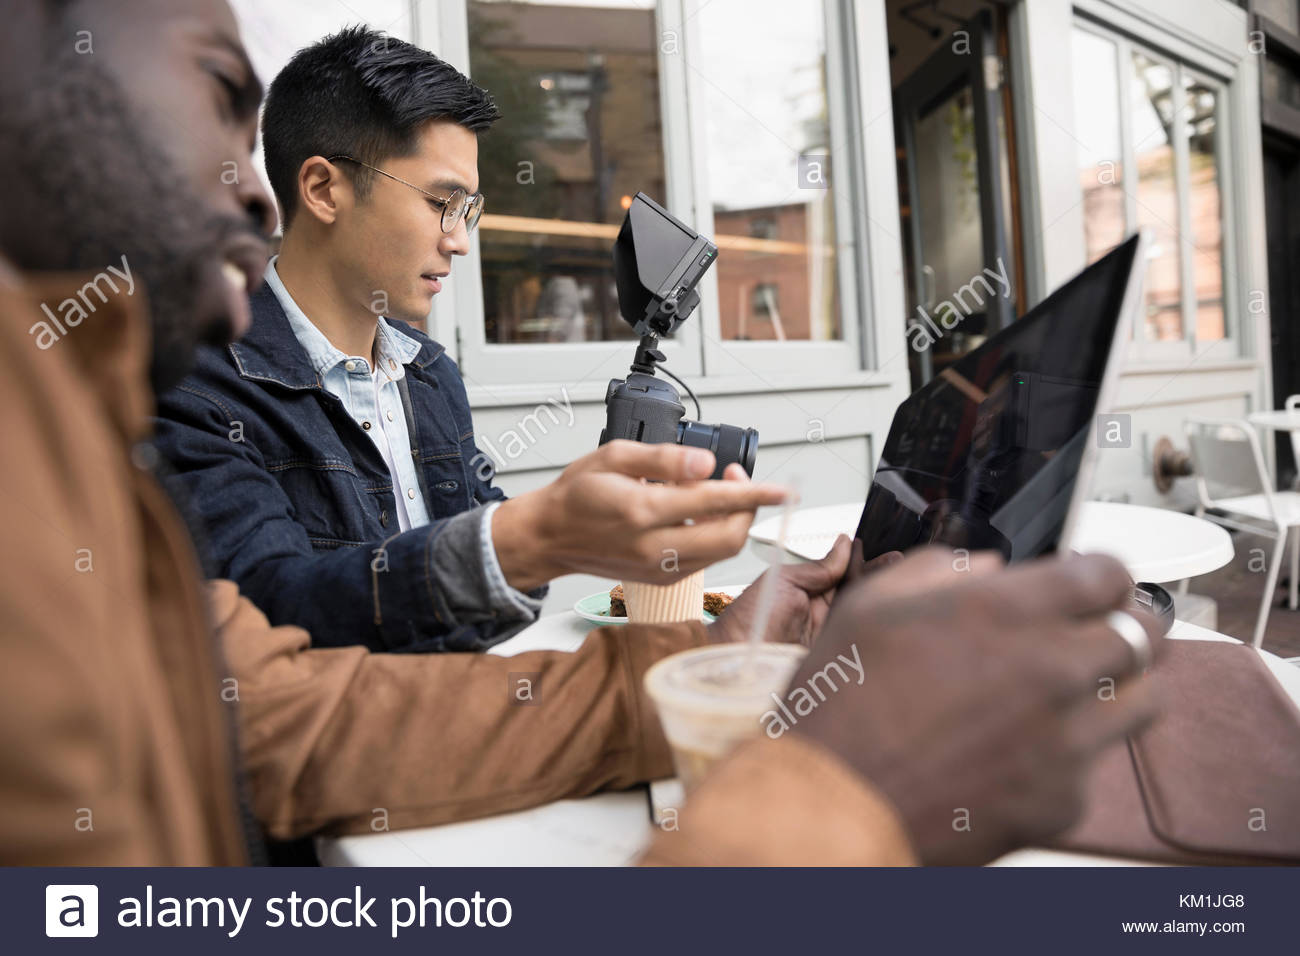 Men friends vlogging, watching video on digital camera at sidewalk cafe - Stock Image